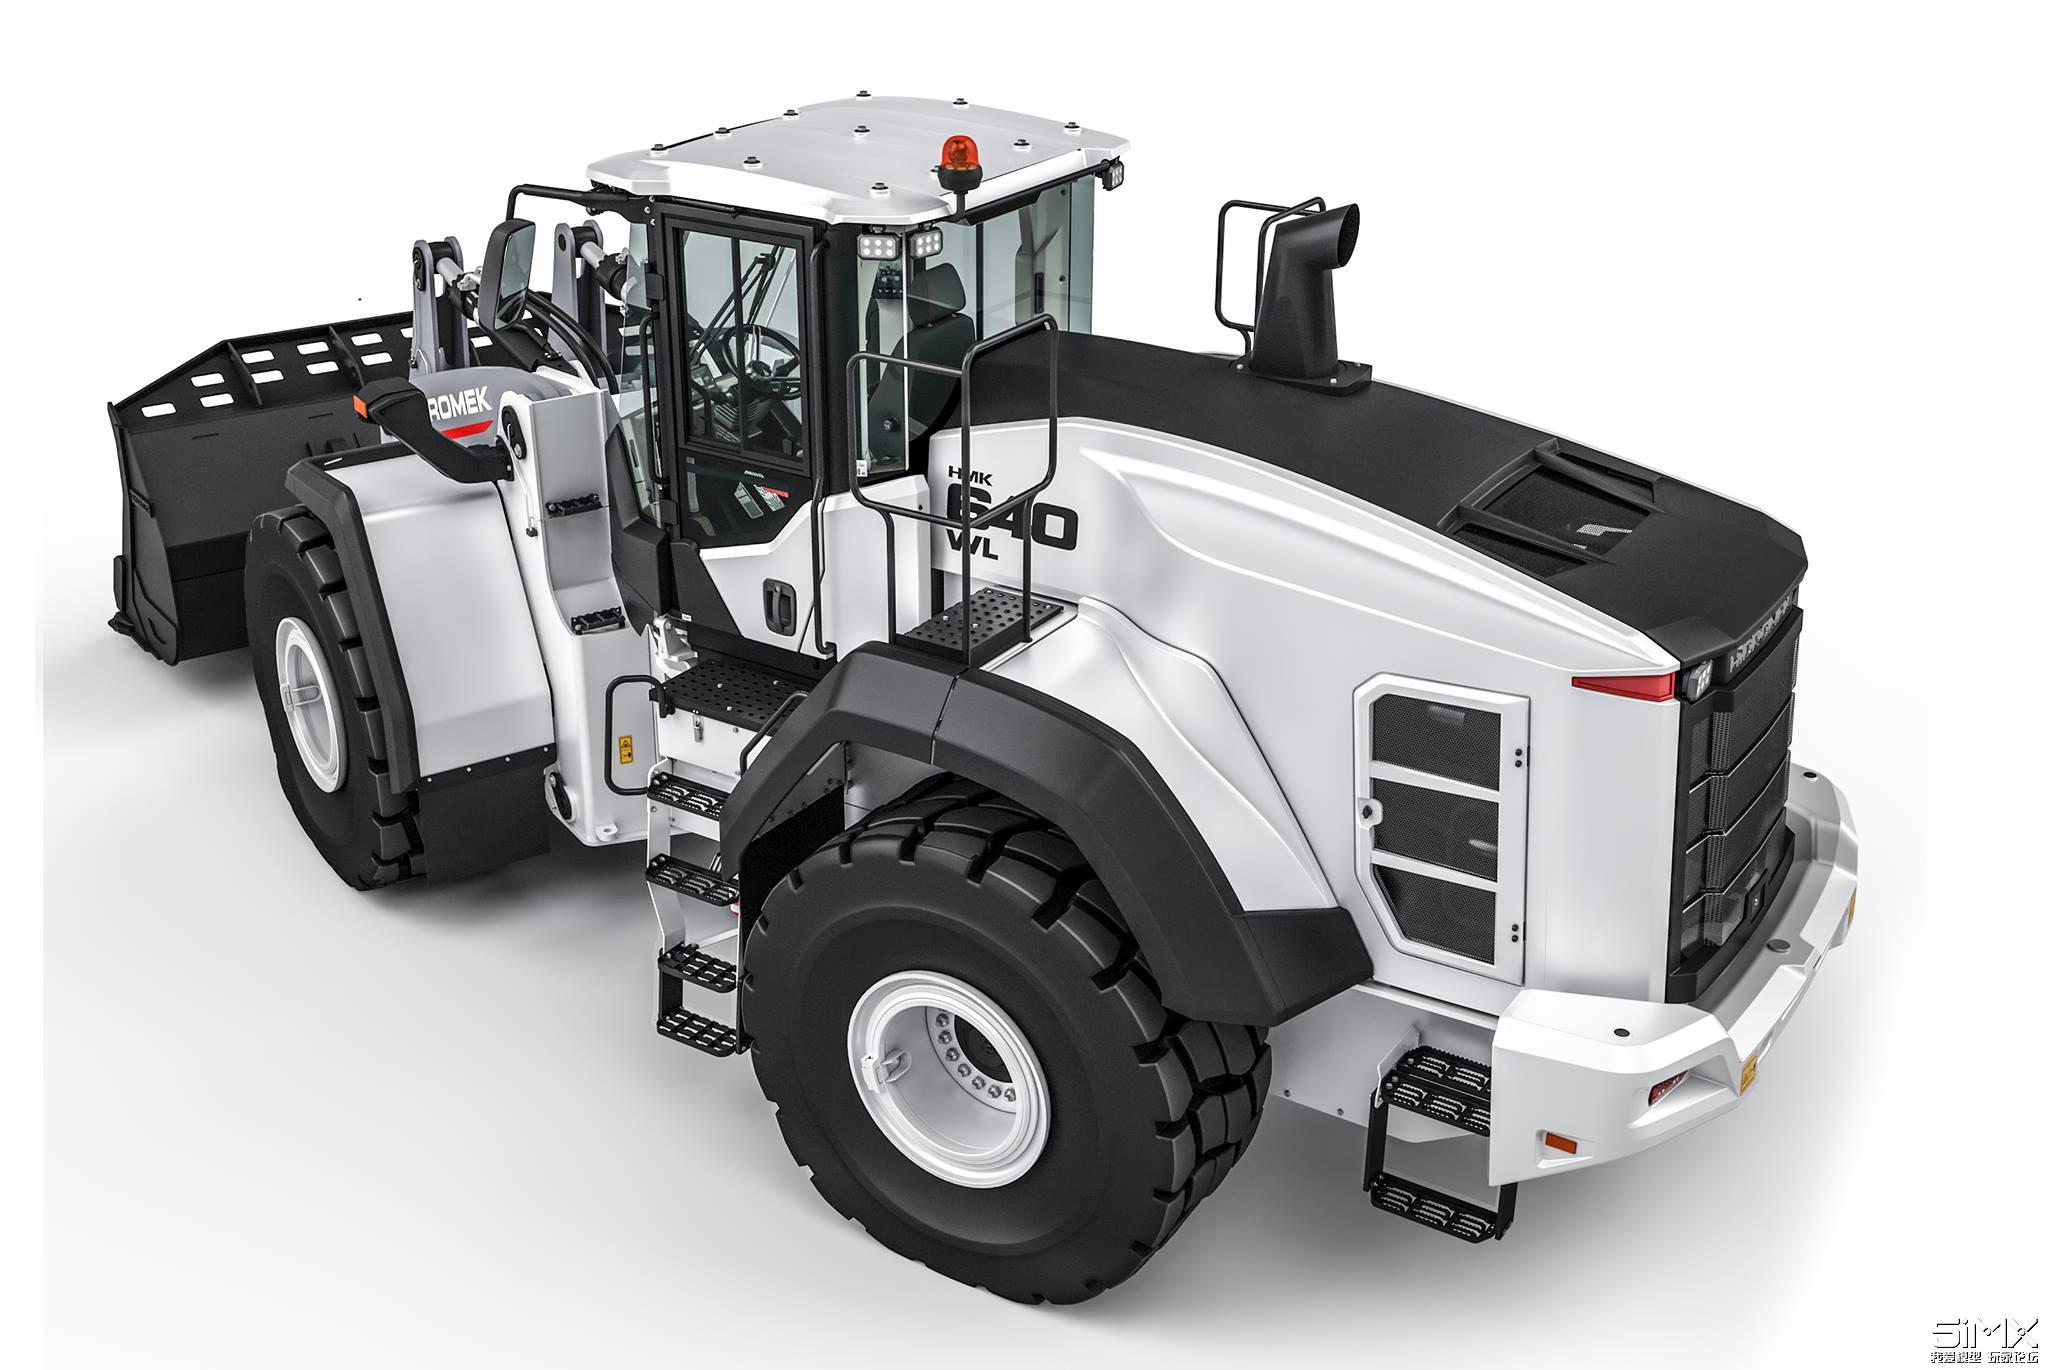 Metalhobi Hidromek 640 WL轮式装载机模型高清大图